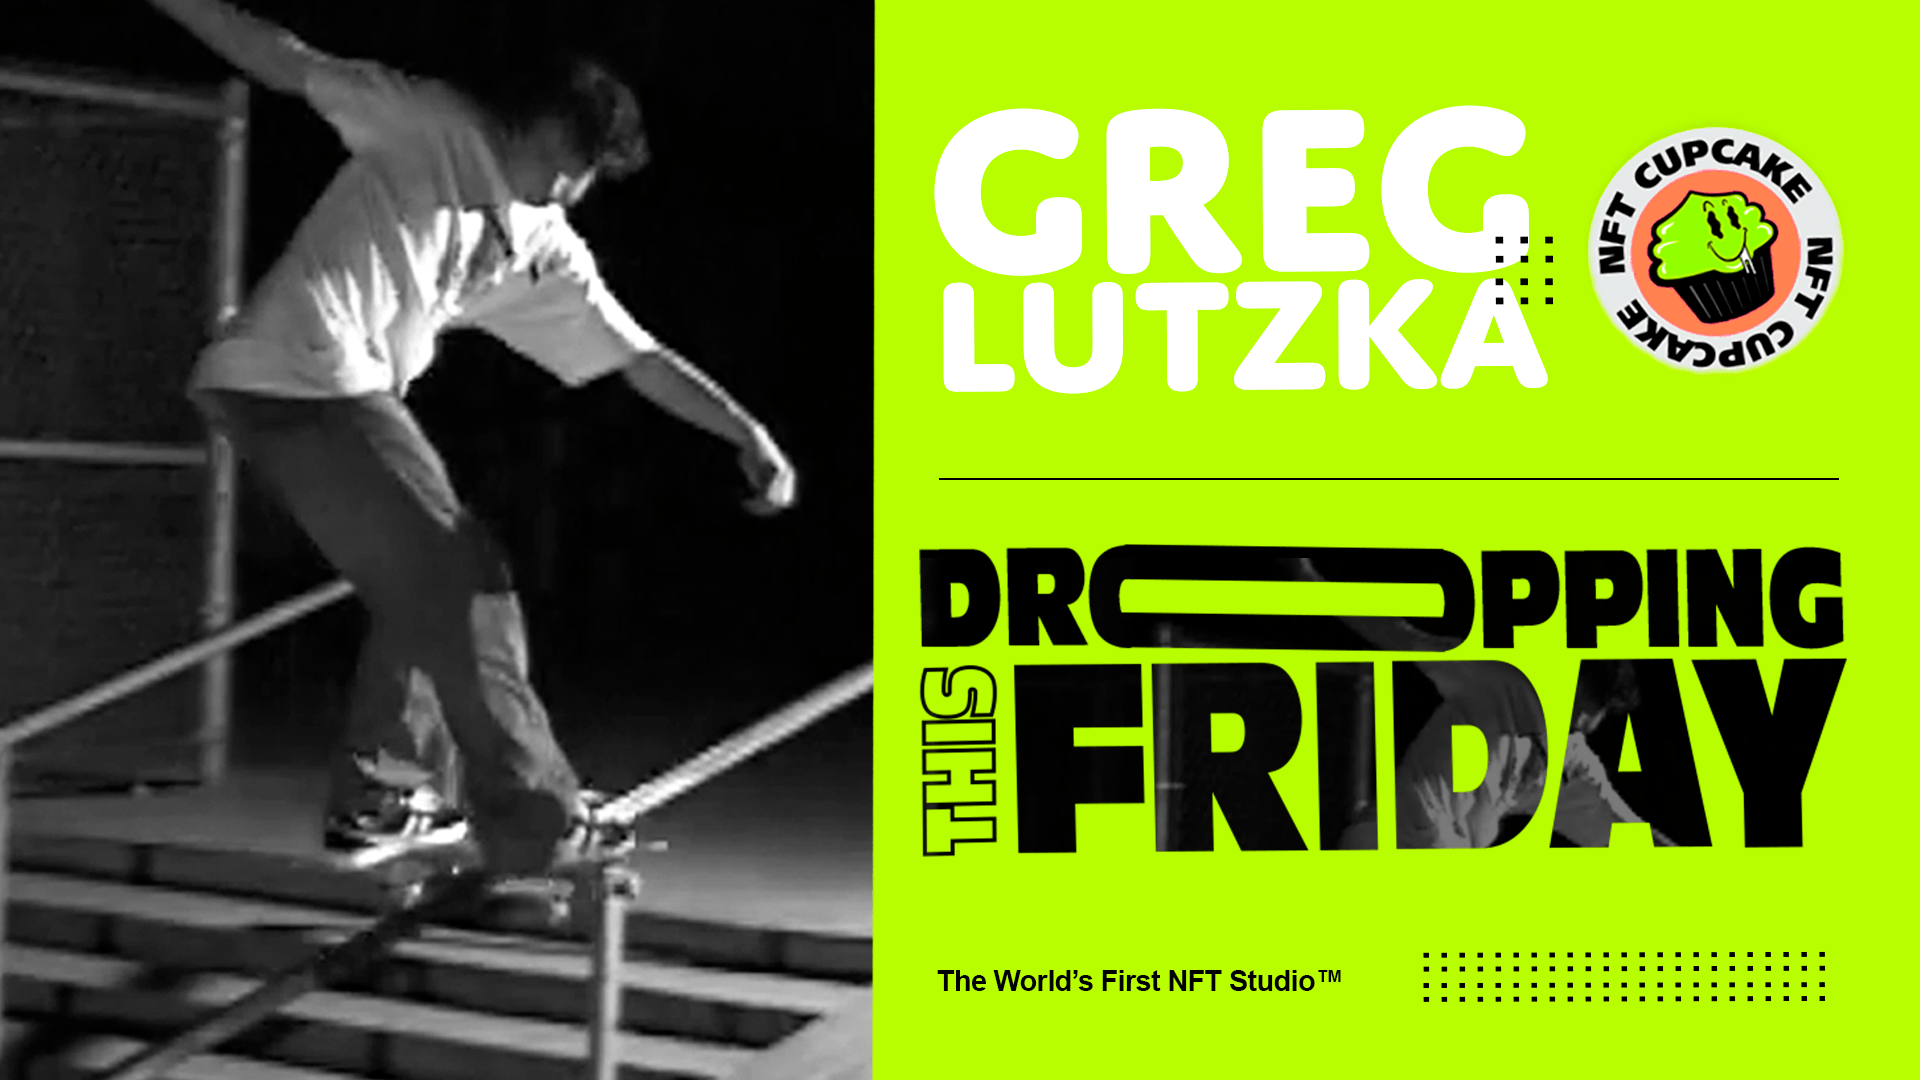 NFT Cupcake: The First Ever Greg Lutzka NFT Launching Tomorrow